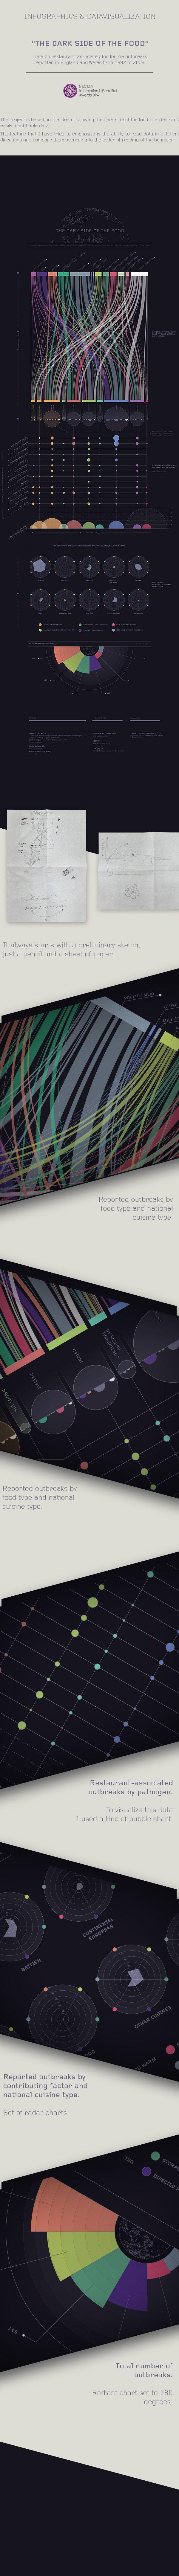 THE DARK SIDE OF THE FOOD - Dark Version on Behance